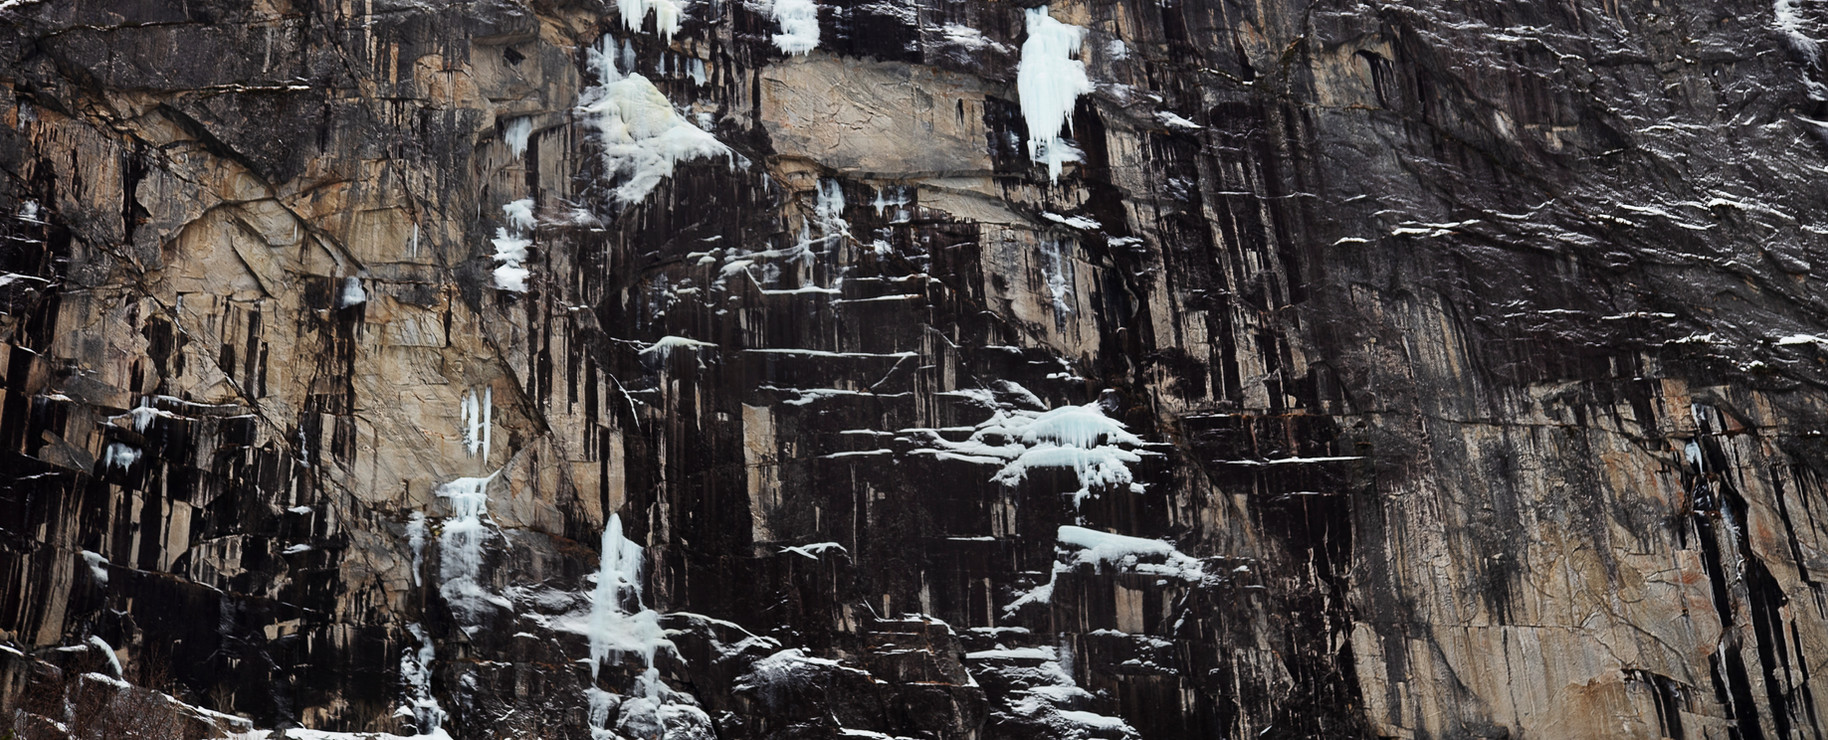 Snow Splattered Rock Face